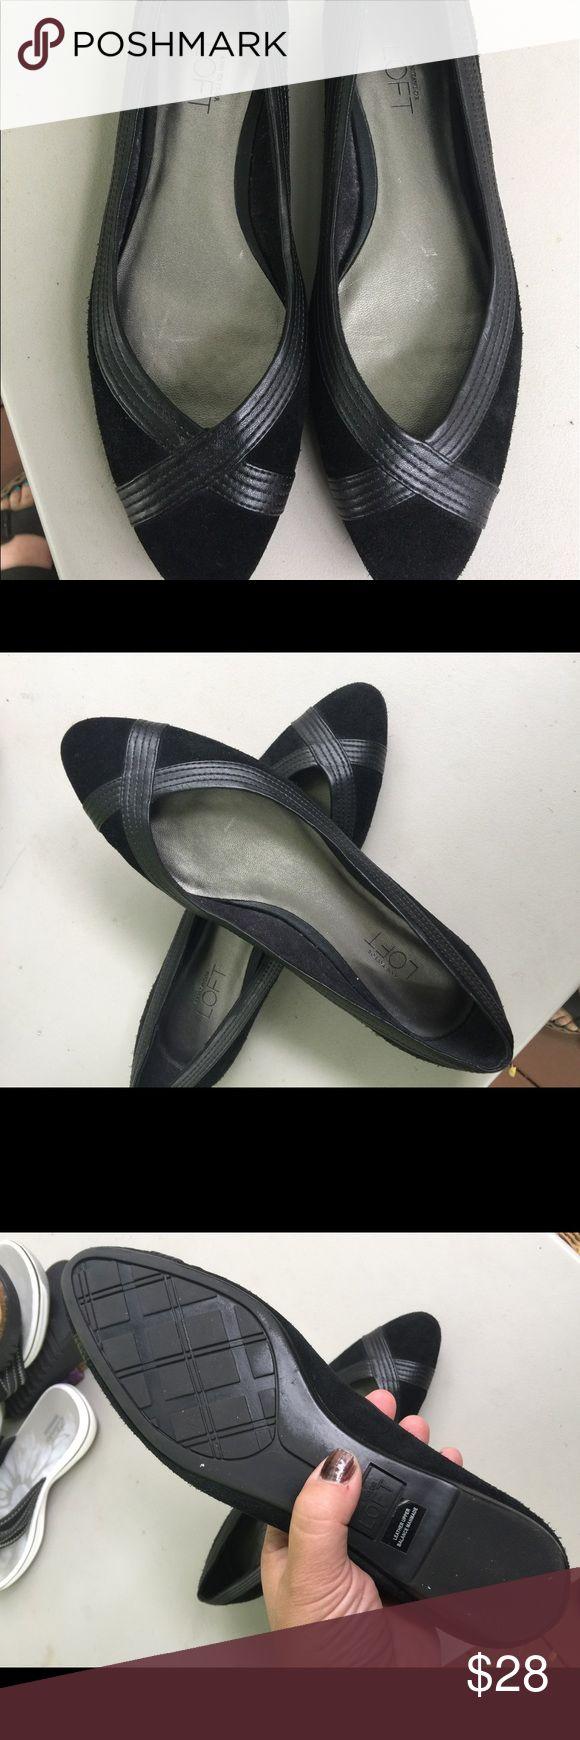 Women's Anne Taylor Loft Black Leather Flats 7M Women's Anne Taylor Loft Black Leather Flats 7M. Black Leather & Suede. Excellent Condition Ann Taylor Shoes Flats & Loafers